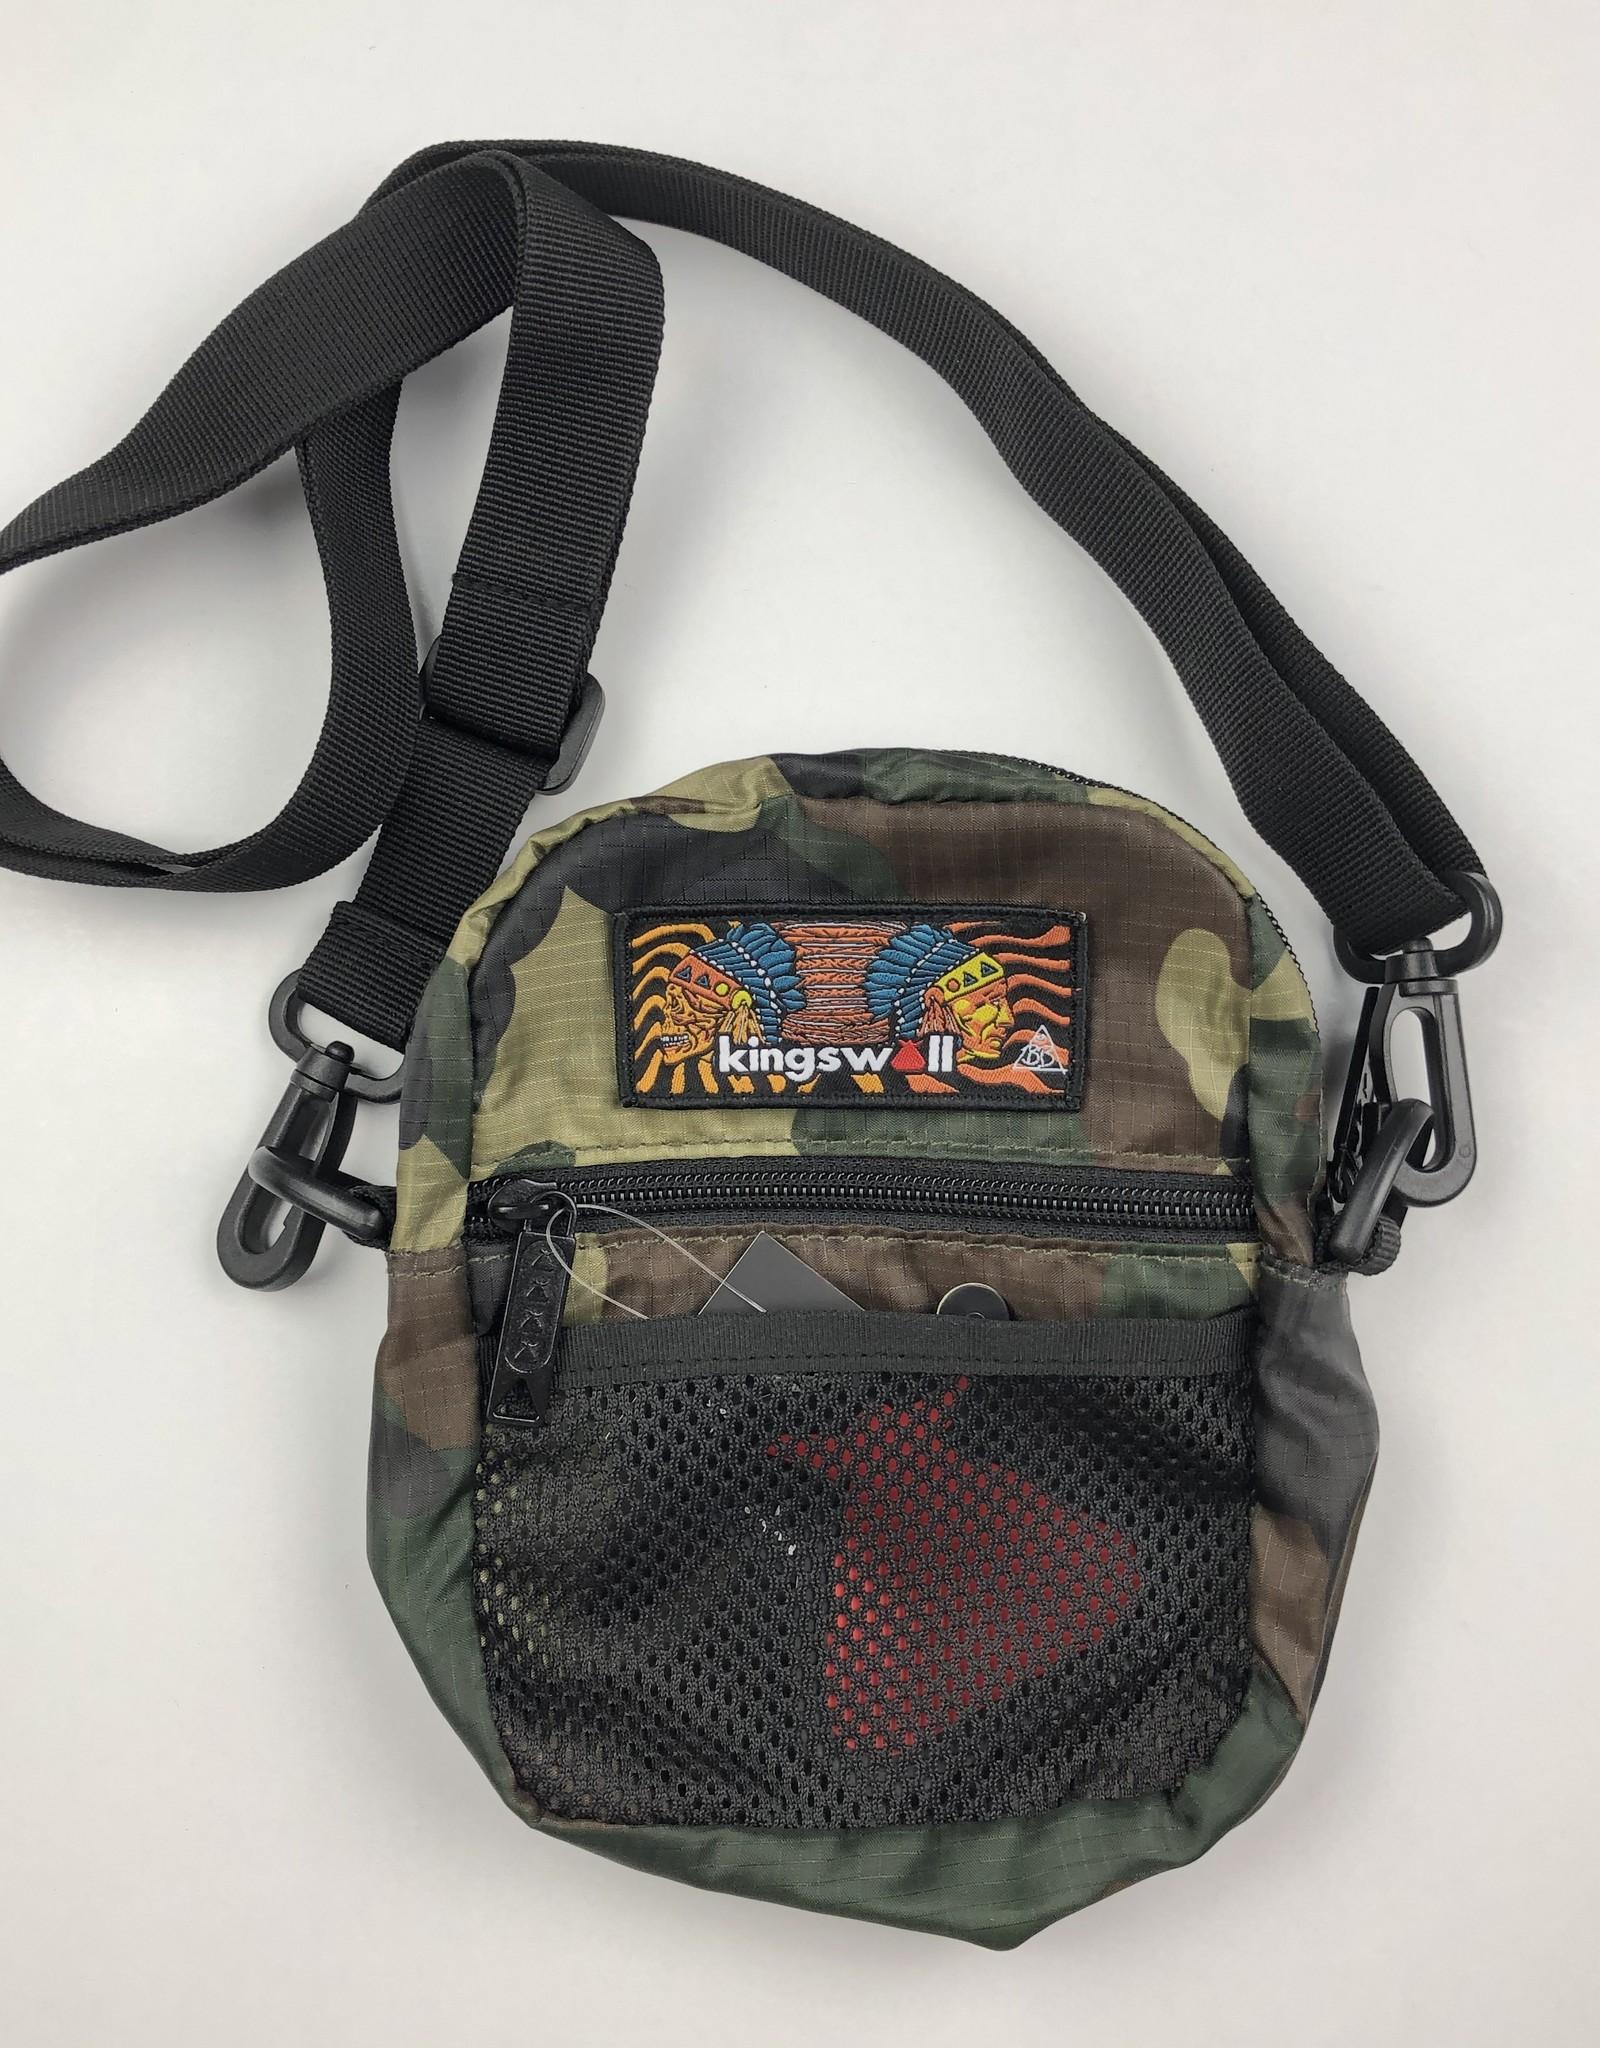 BUMBAG KINGSWELL X BUMBAG COMPACT SHOULDER BAG - (ALL COLORS)